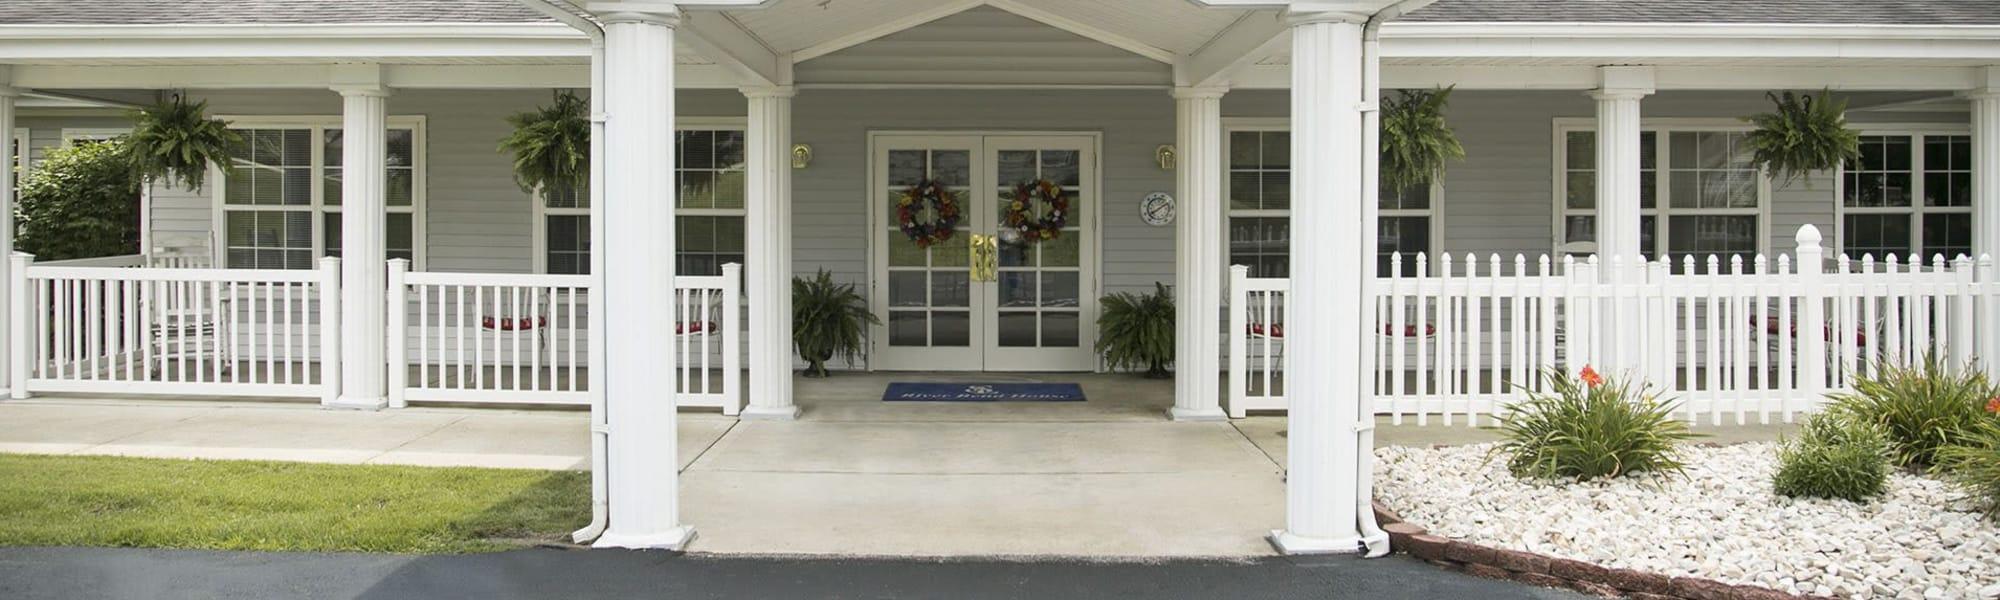 Photo Gallery at Randall Residence of Wheelersburg in Wheelersburg, Ohio